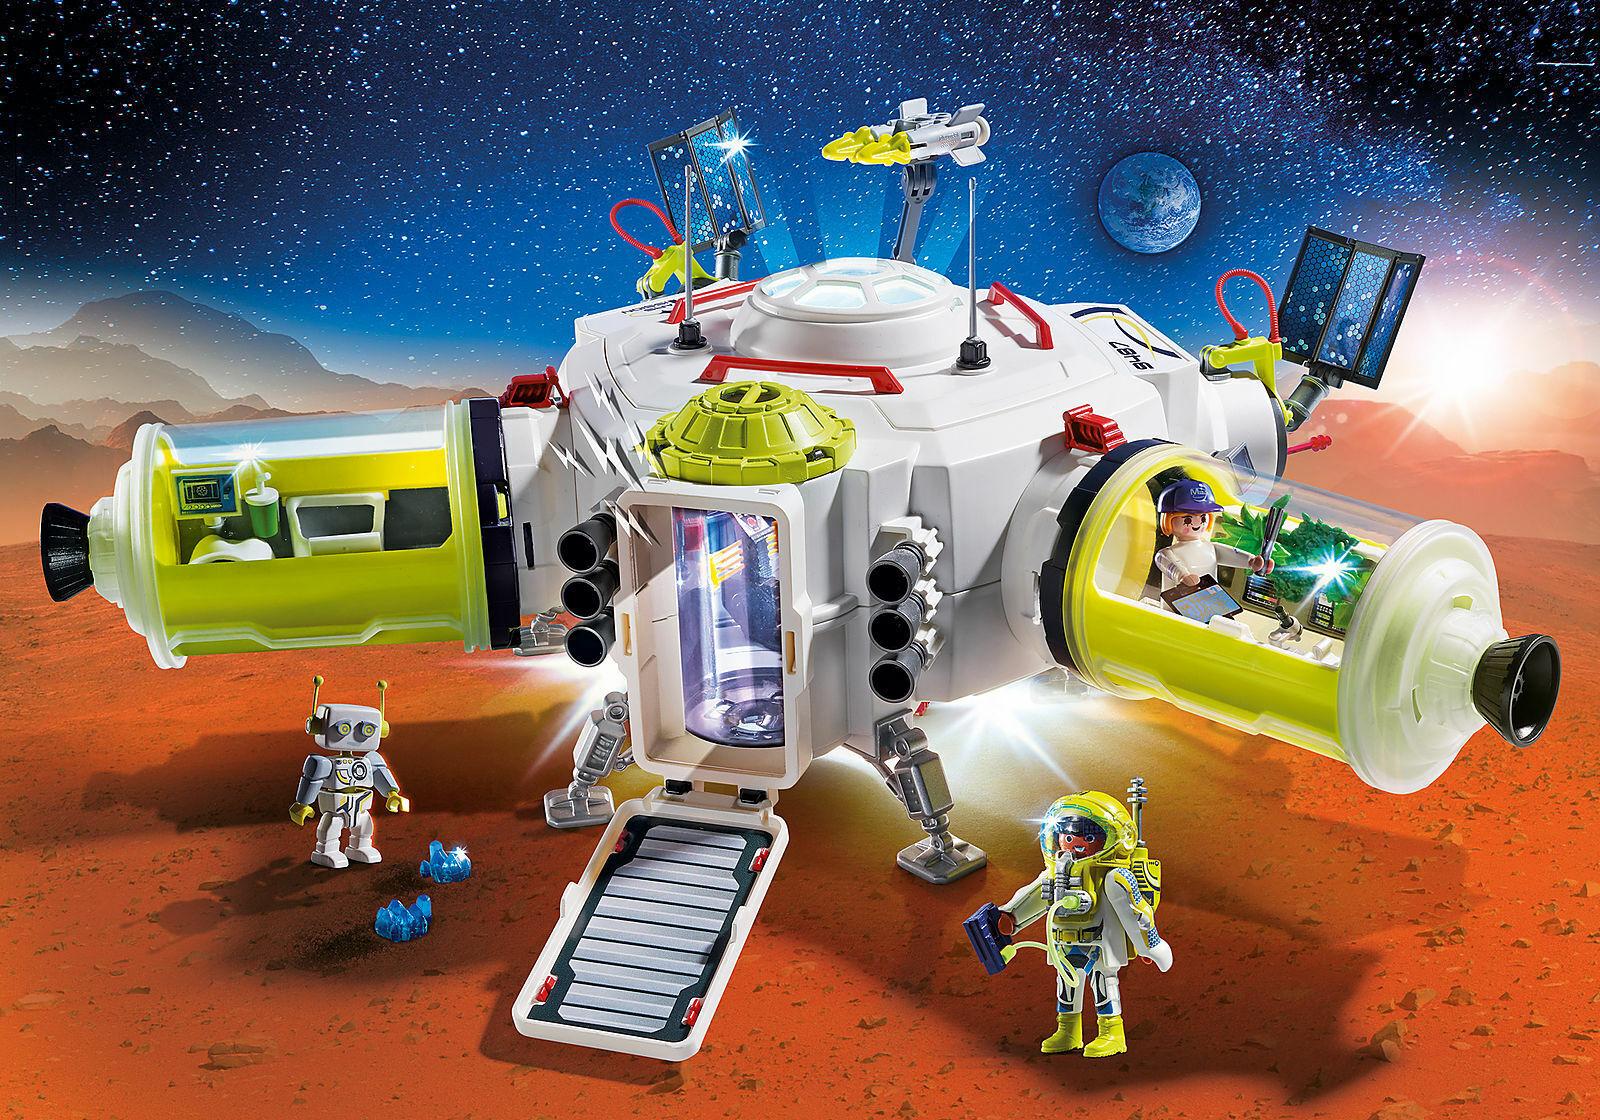 JugarMOBIL 9487 ESTACION DE MARTE - Mars Space Station - Station spatiale Mars